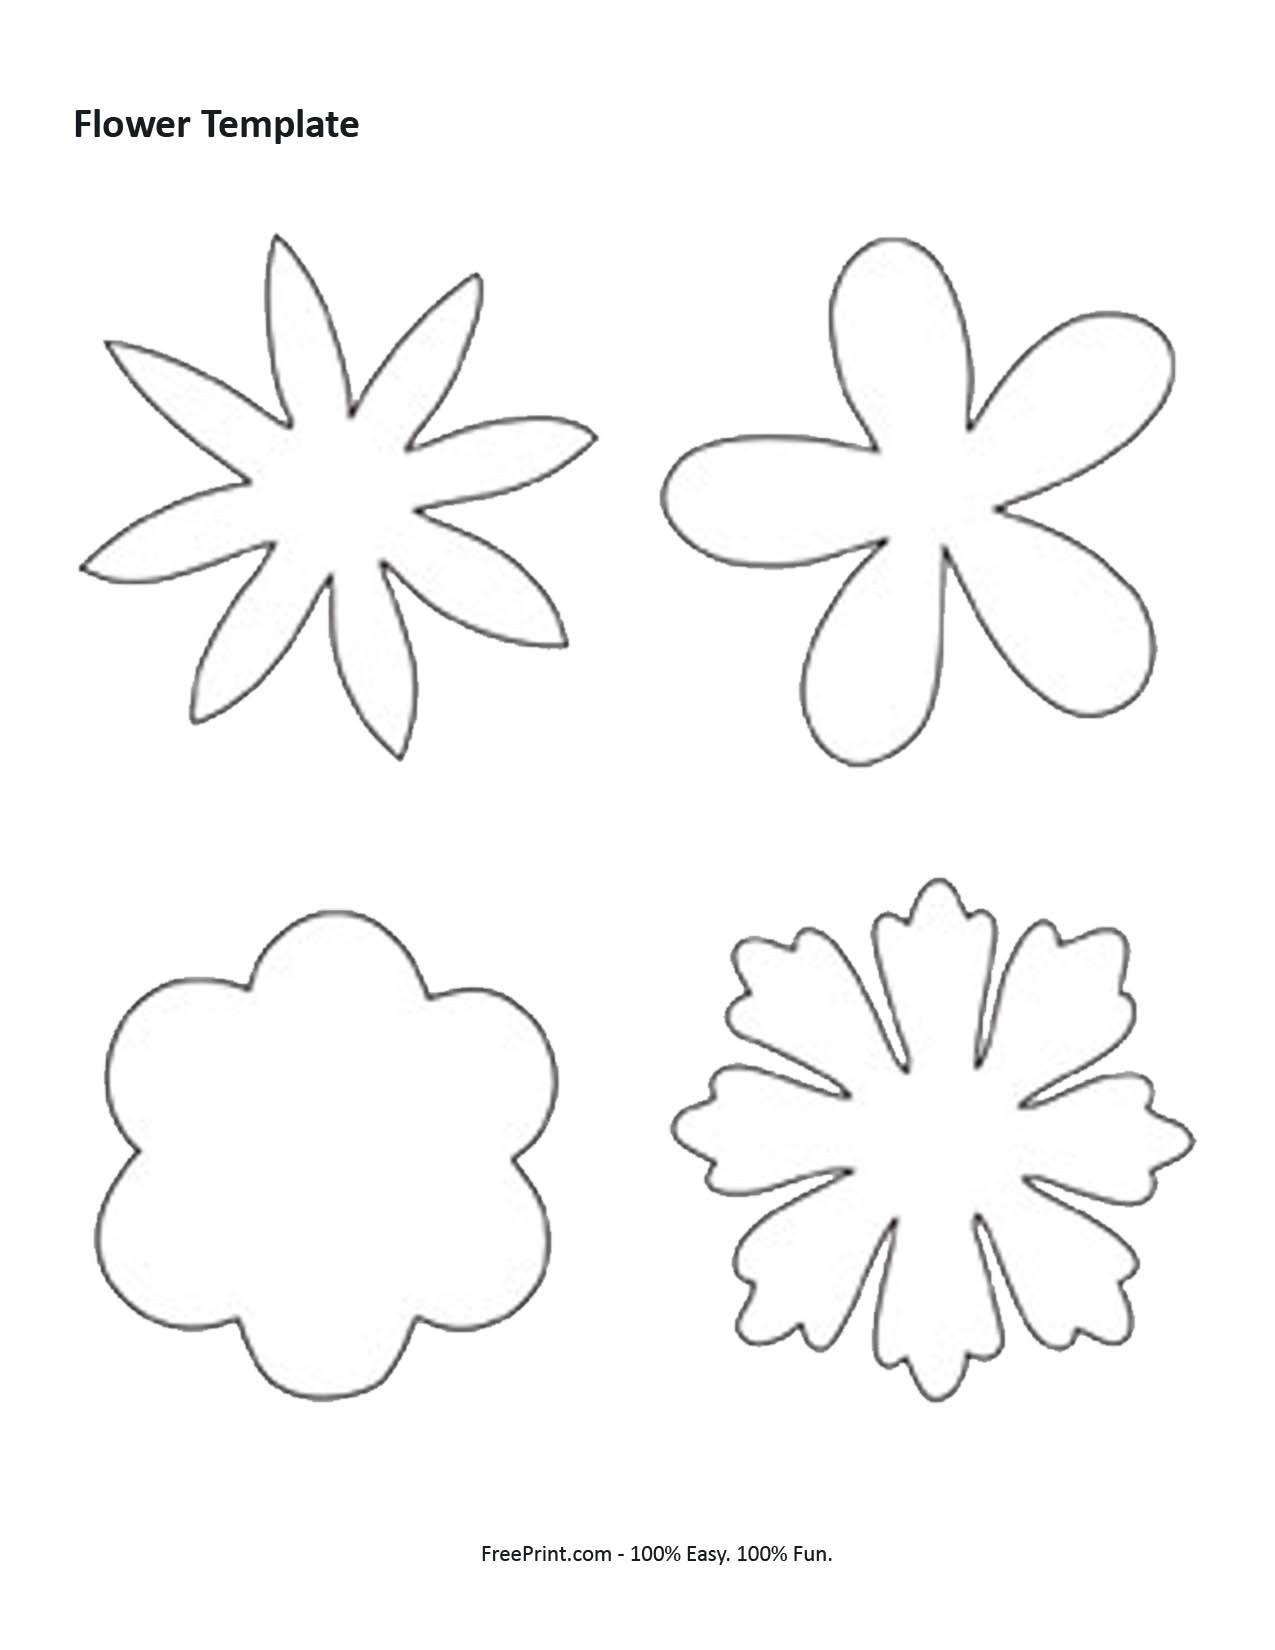 7 Best Images Of Shape Flower Printable Templates - Free Printable - Free Printable Flower Template